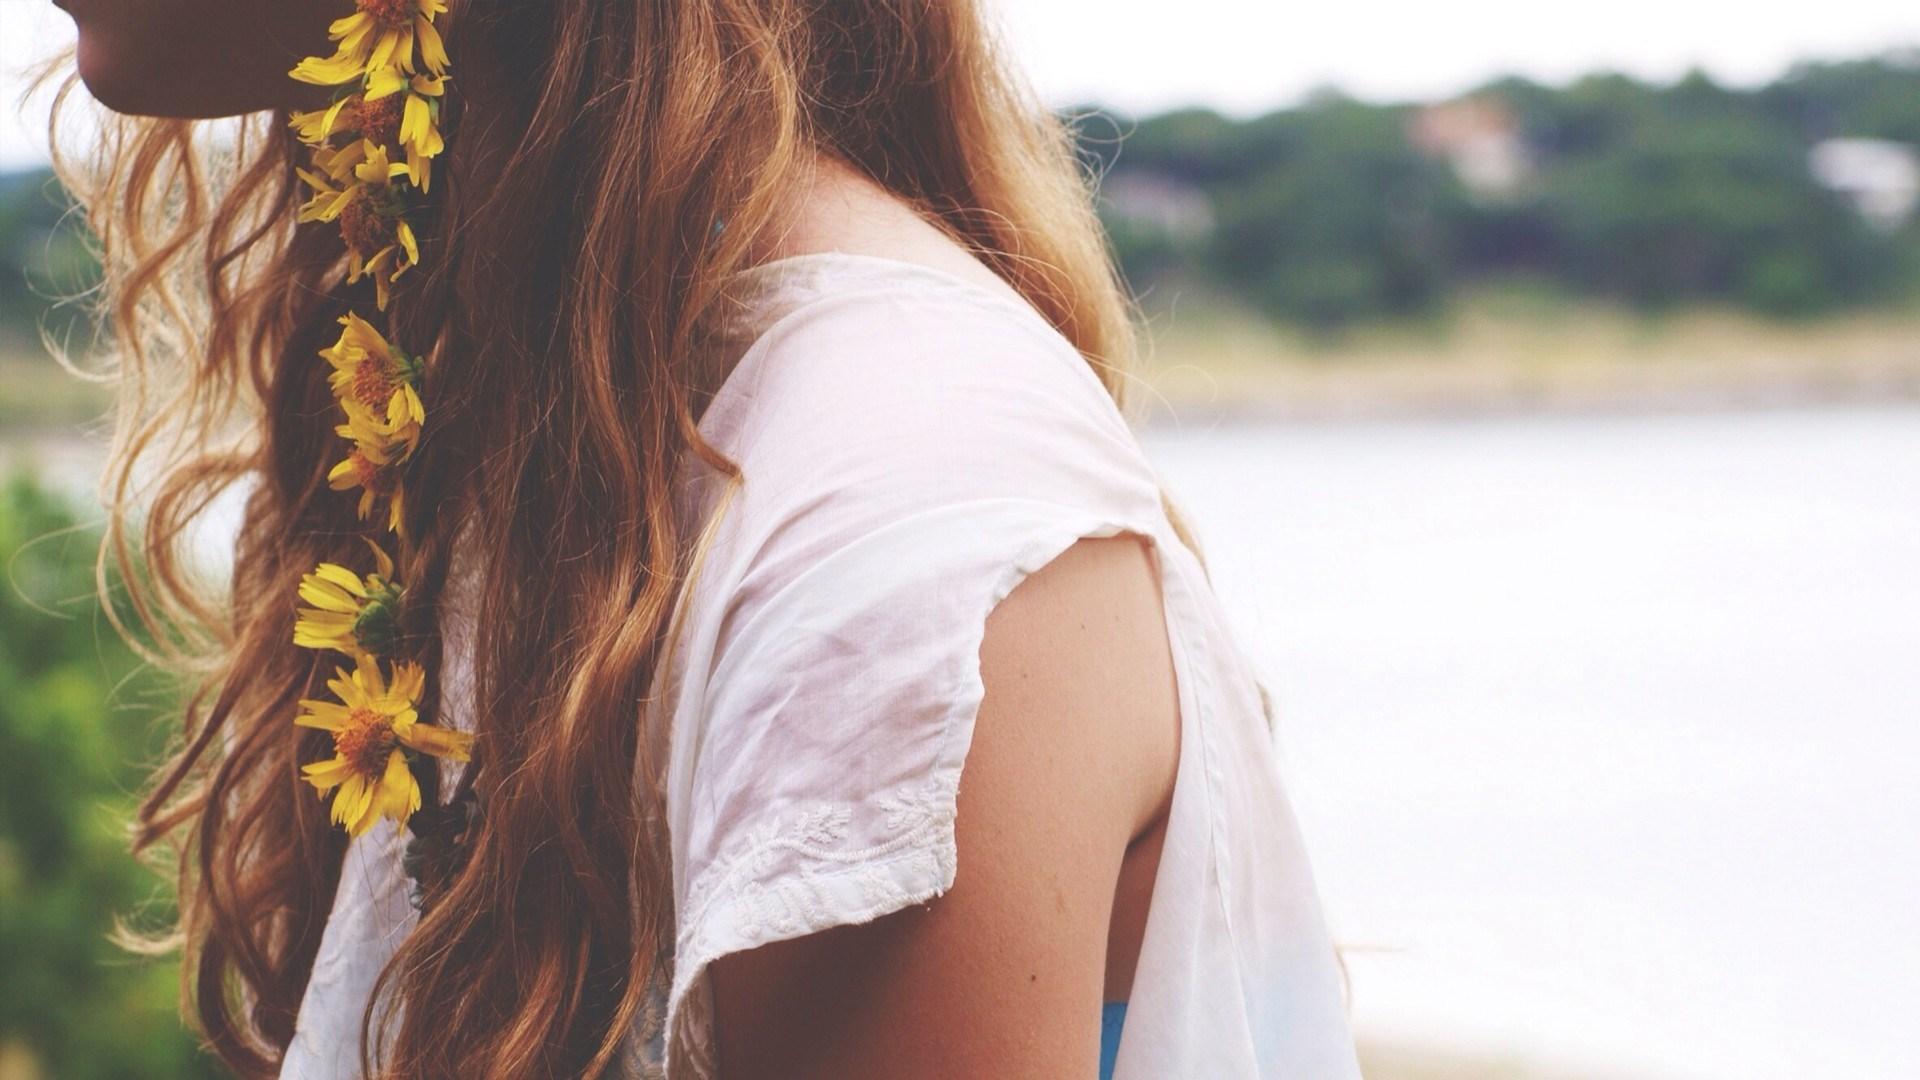 Girl Redhead Flowers Yellow Mood